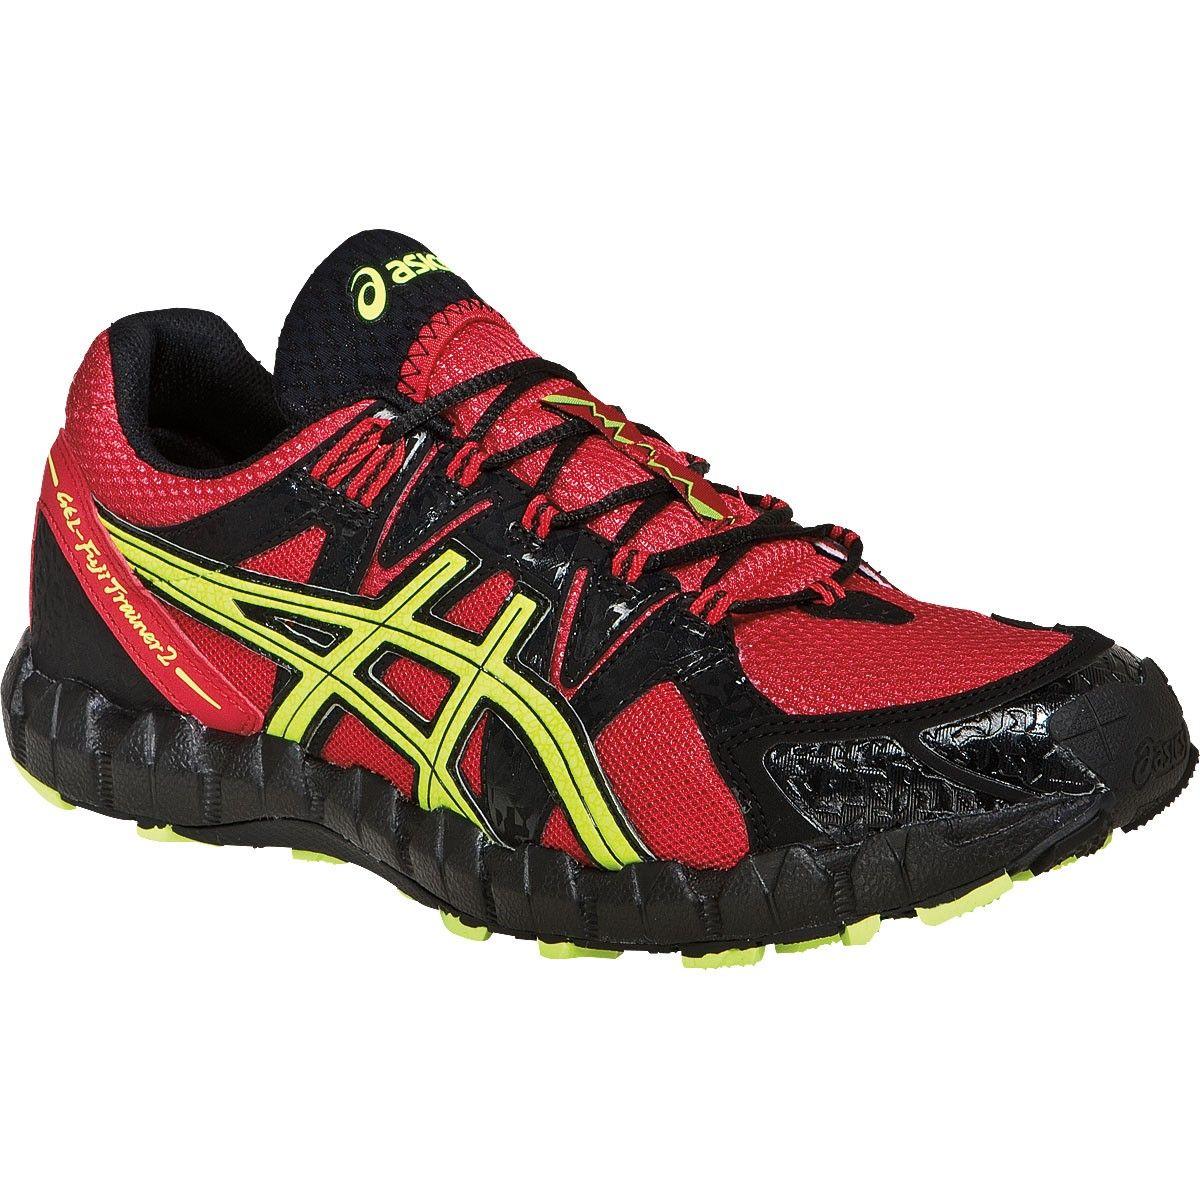 Chaussures GEL Trail Asics Asics GEL Fujitrainer 2 pour Homme Chaussures   70b275c - igoumenitsa.info